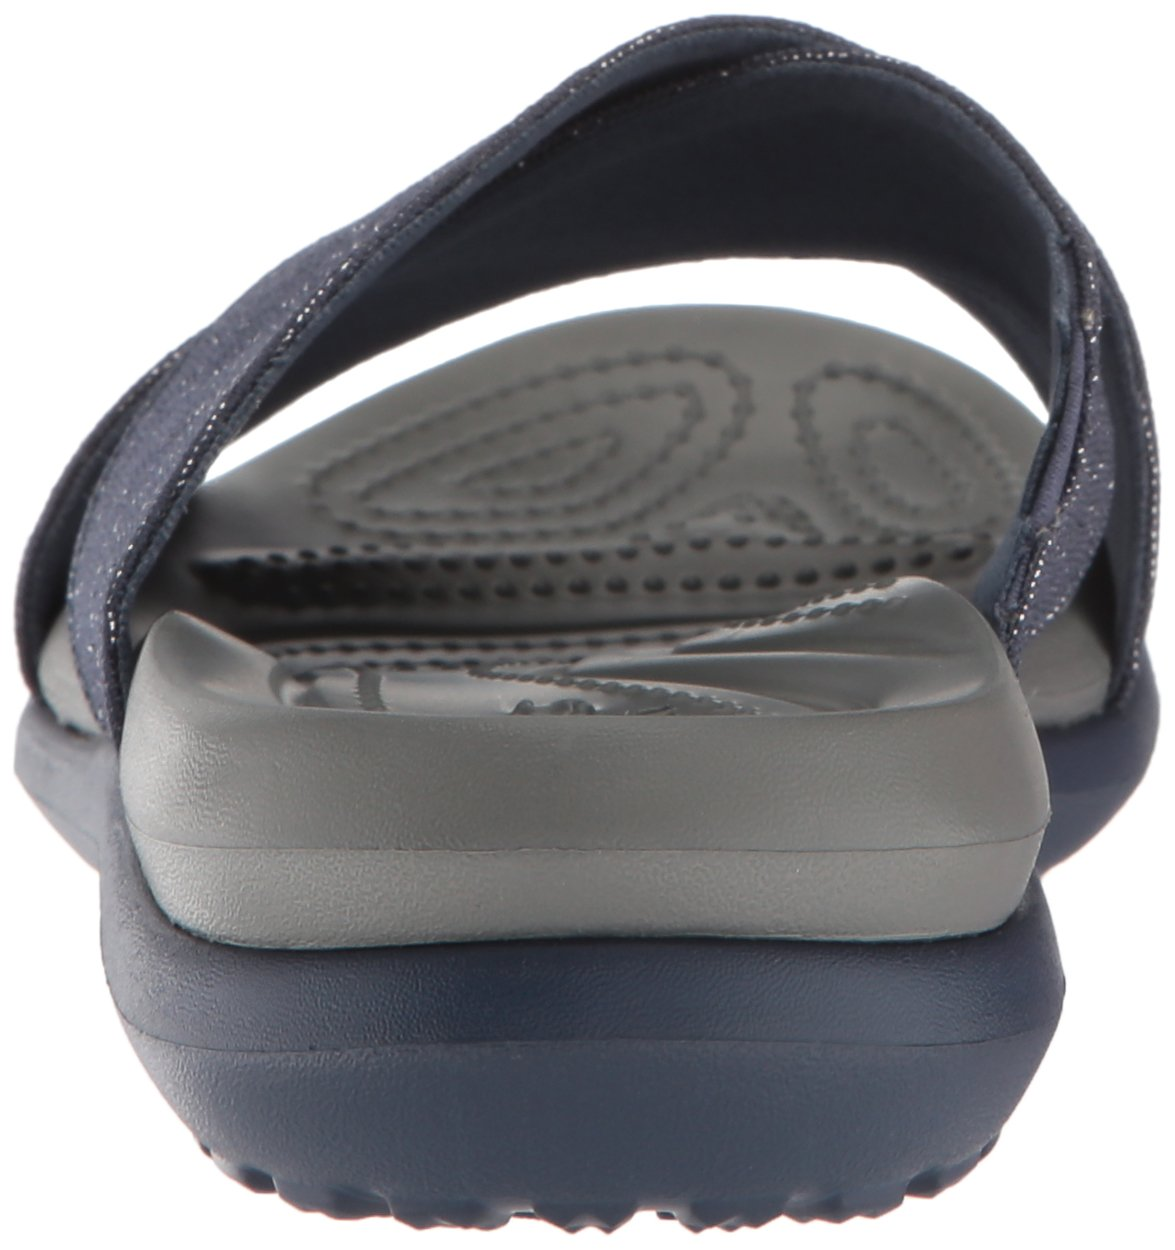 Crocs Women's Capri Shimmer Cross-Band Sandal B078F698CY 11 M US Navy/Slate Grey